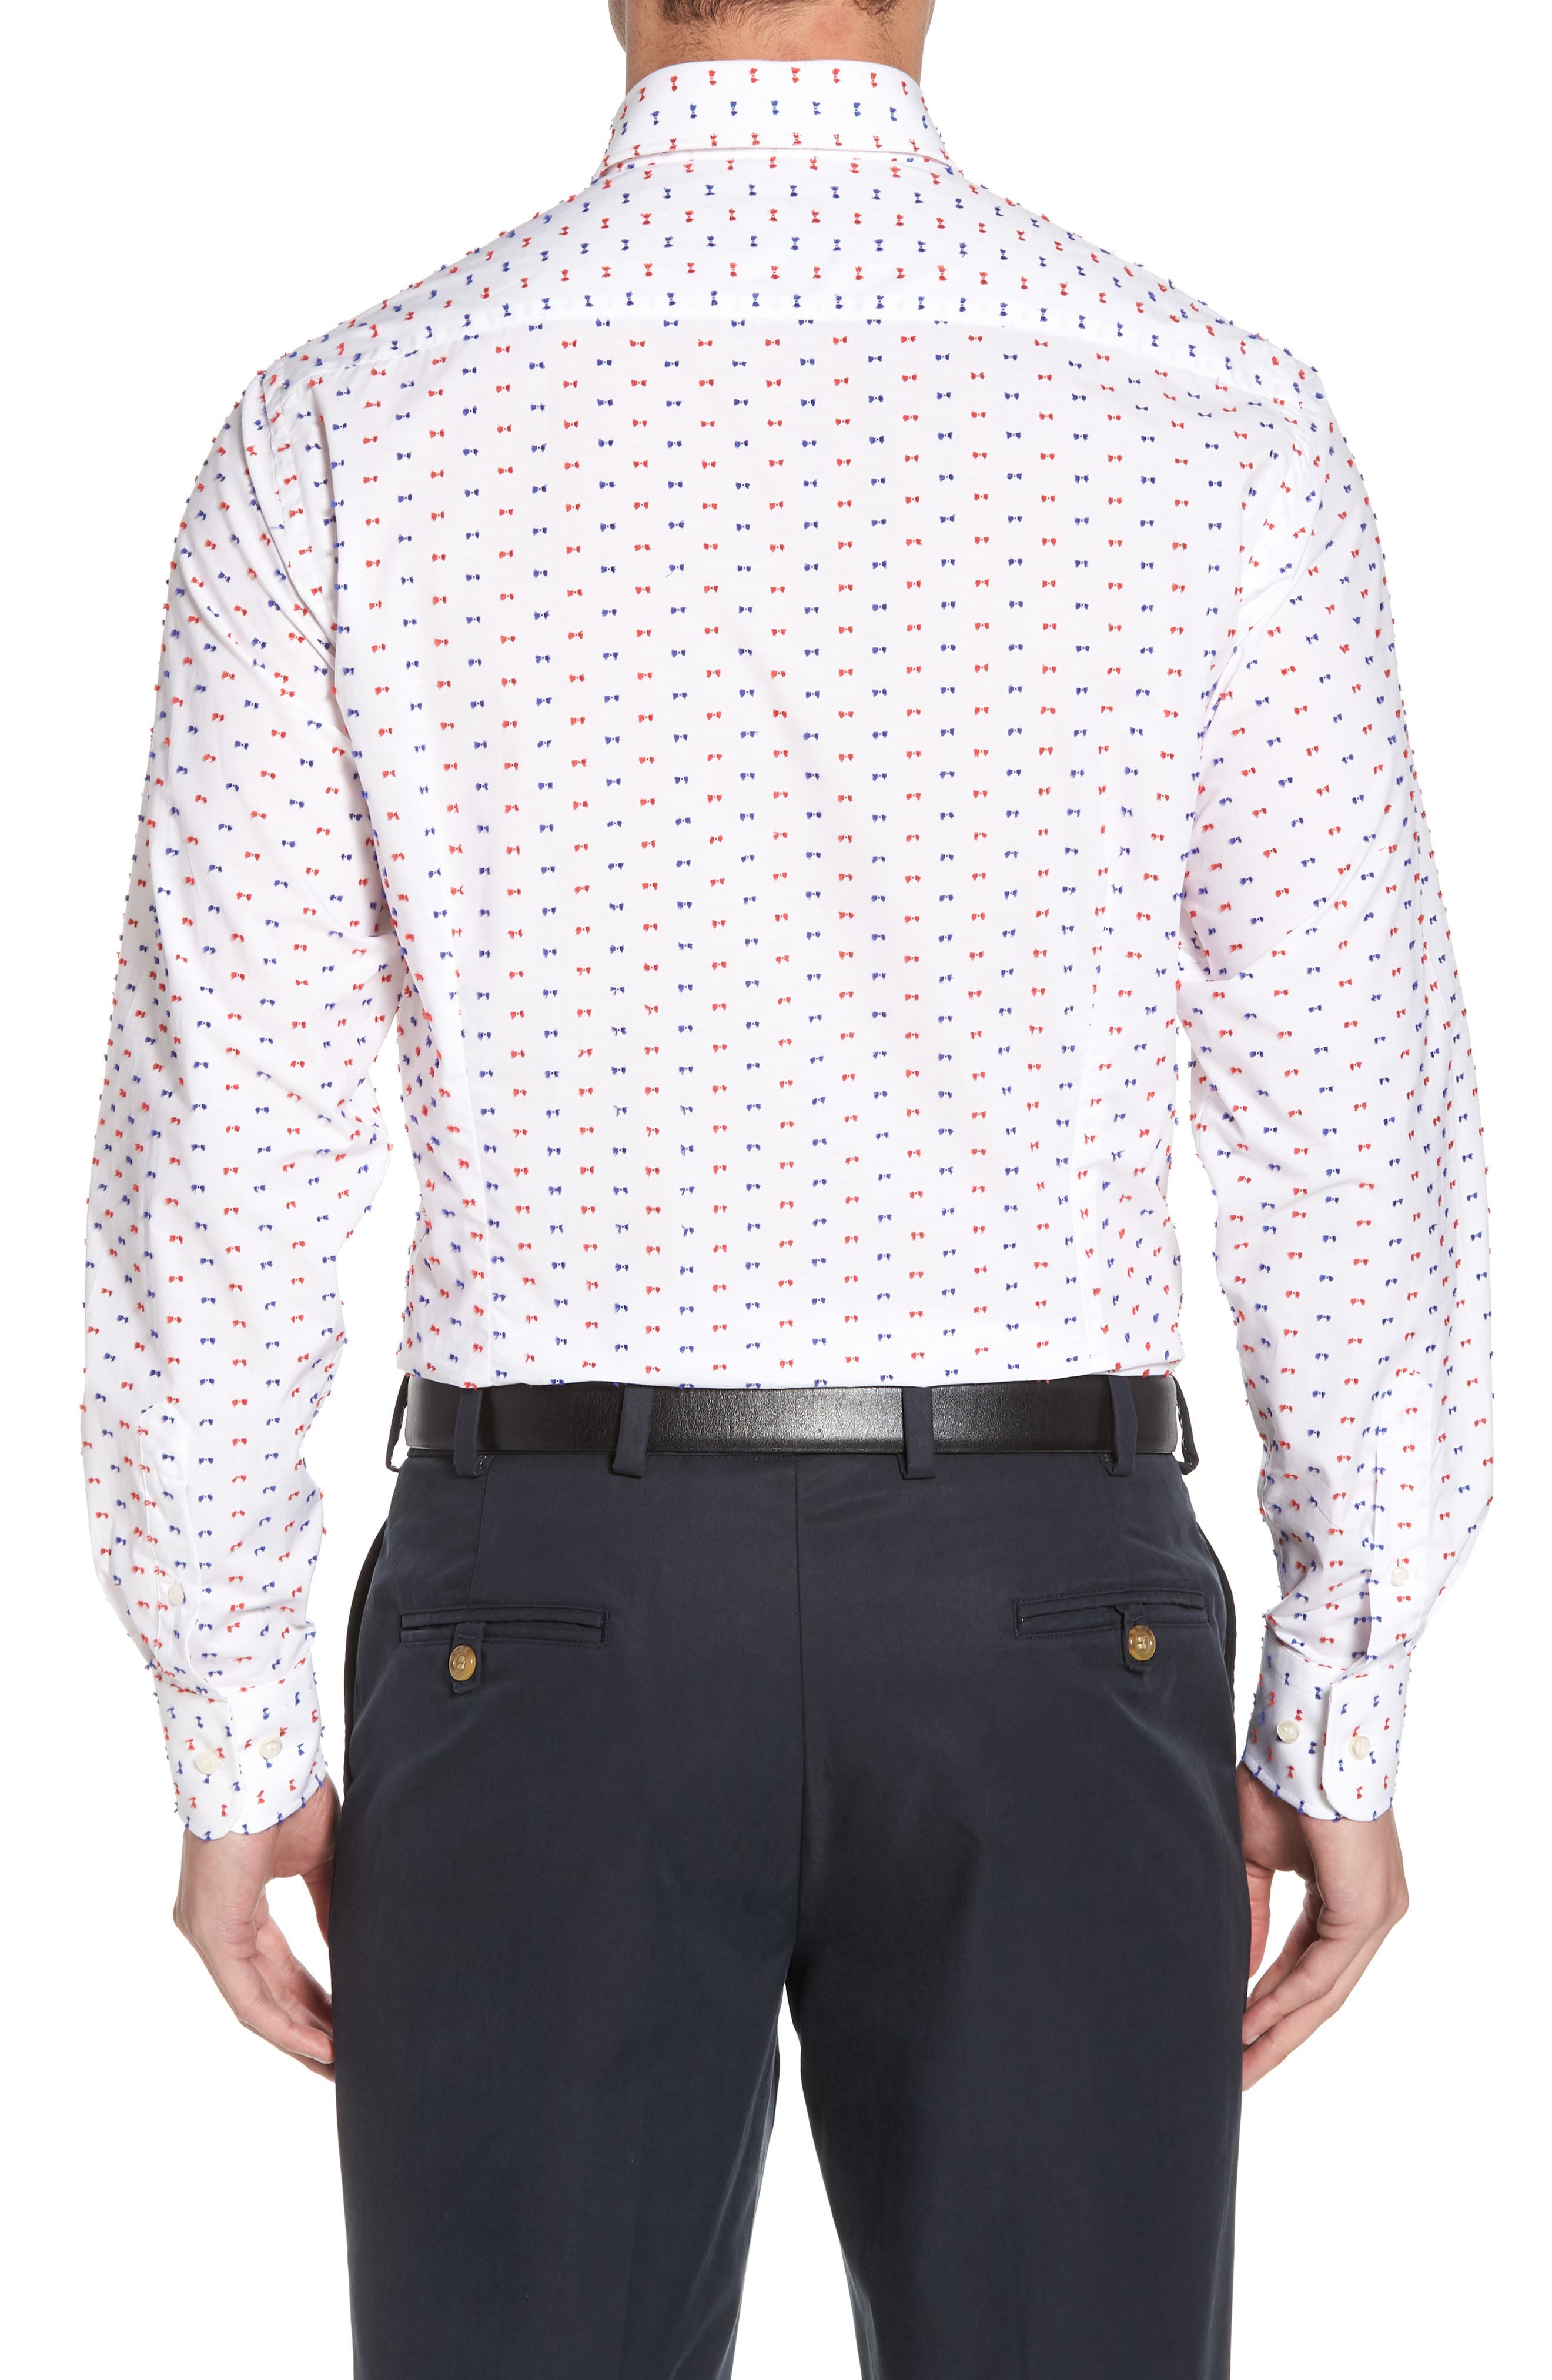 Paul&Shark Regular Fit Feathered Sport Shirt,                             Alternate thumbnail 2, color,                             White